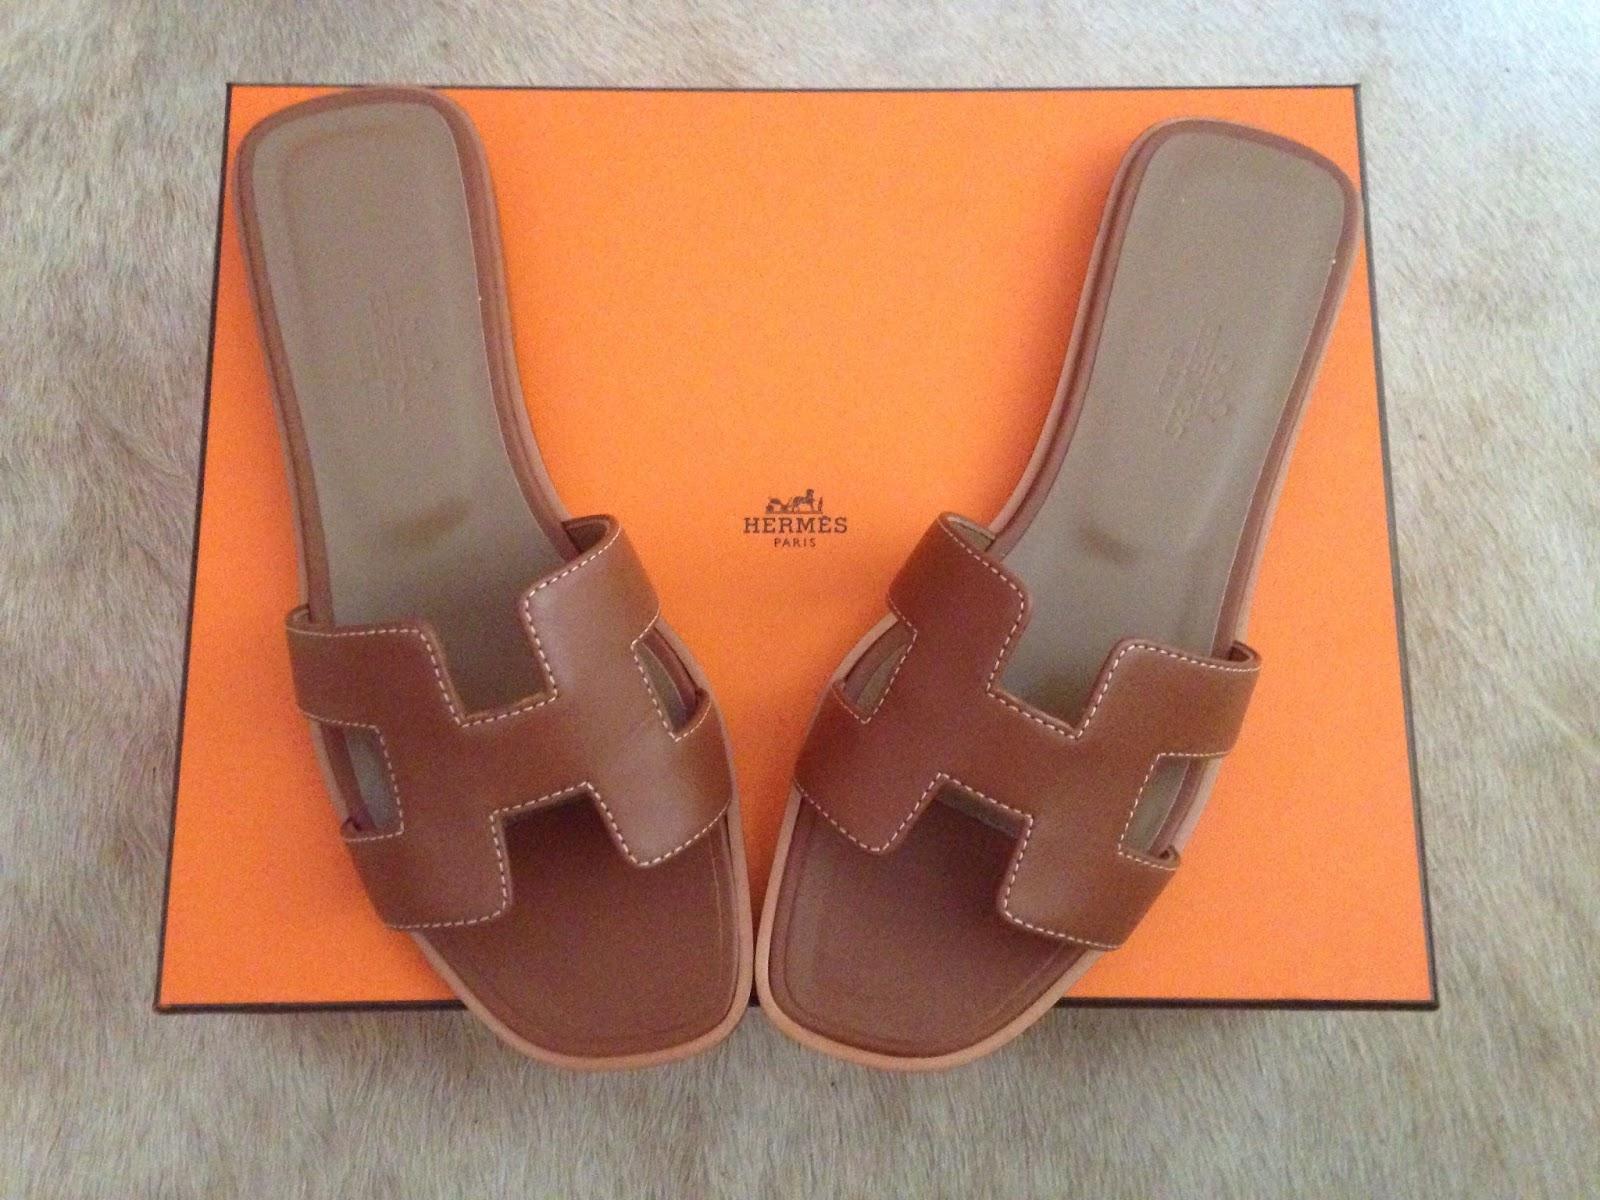 hermes oran, hermes sandals, orange box, luxury, designer